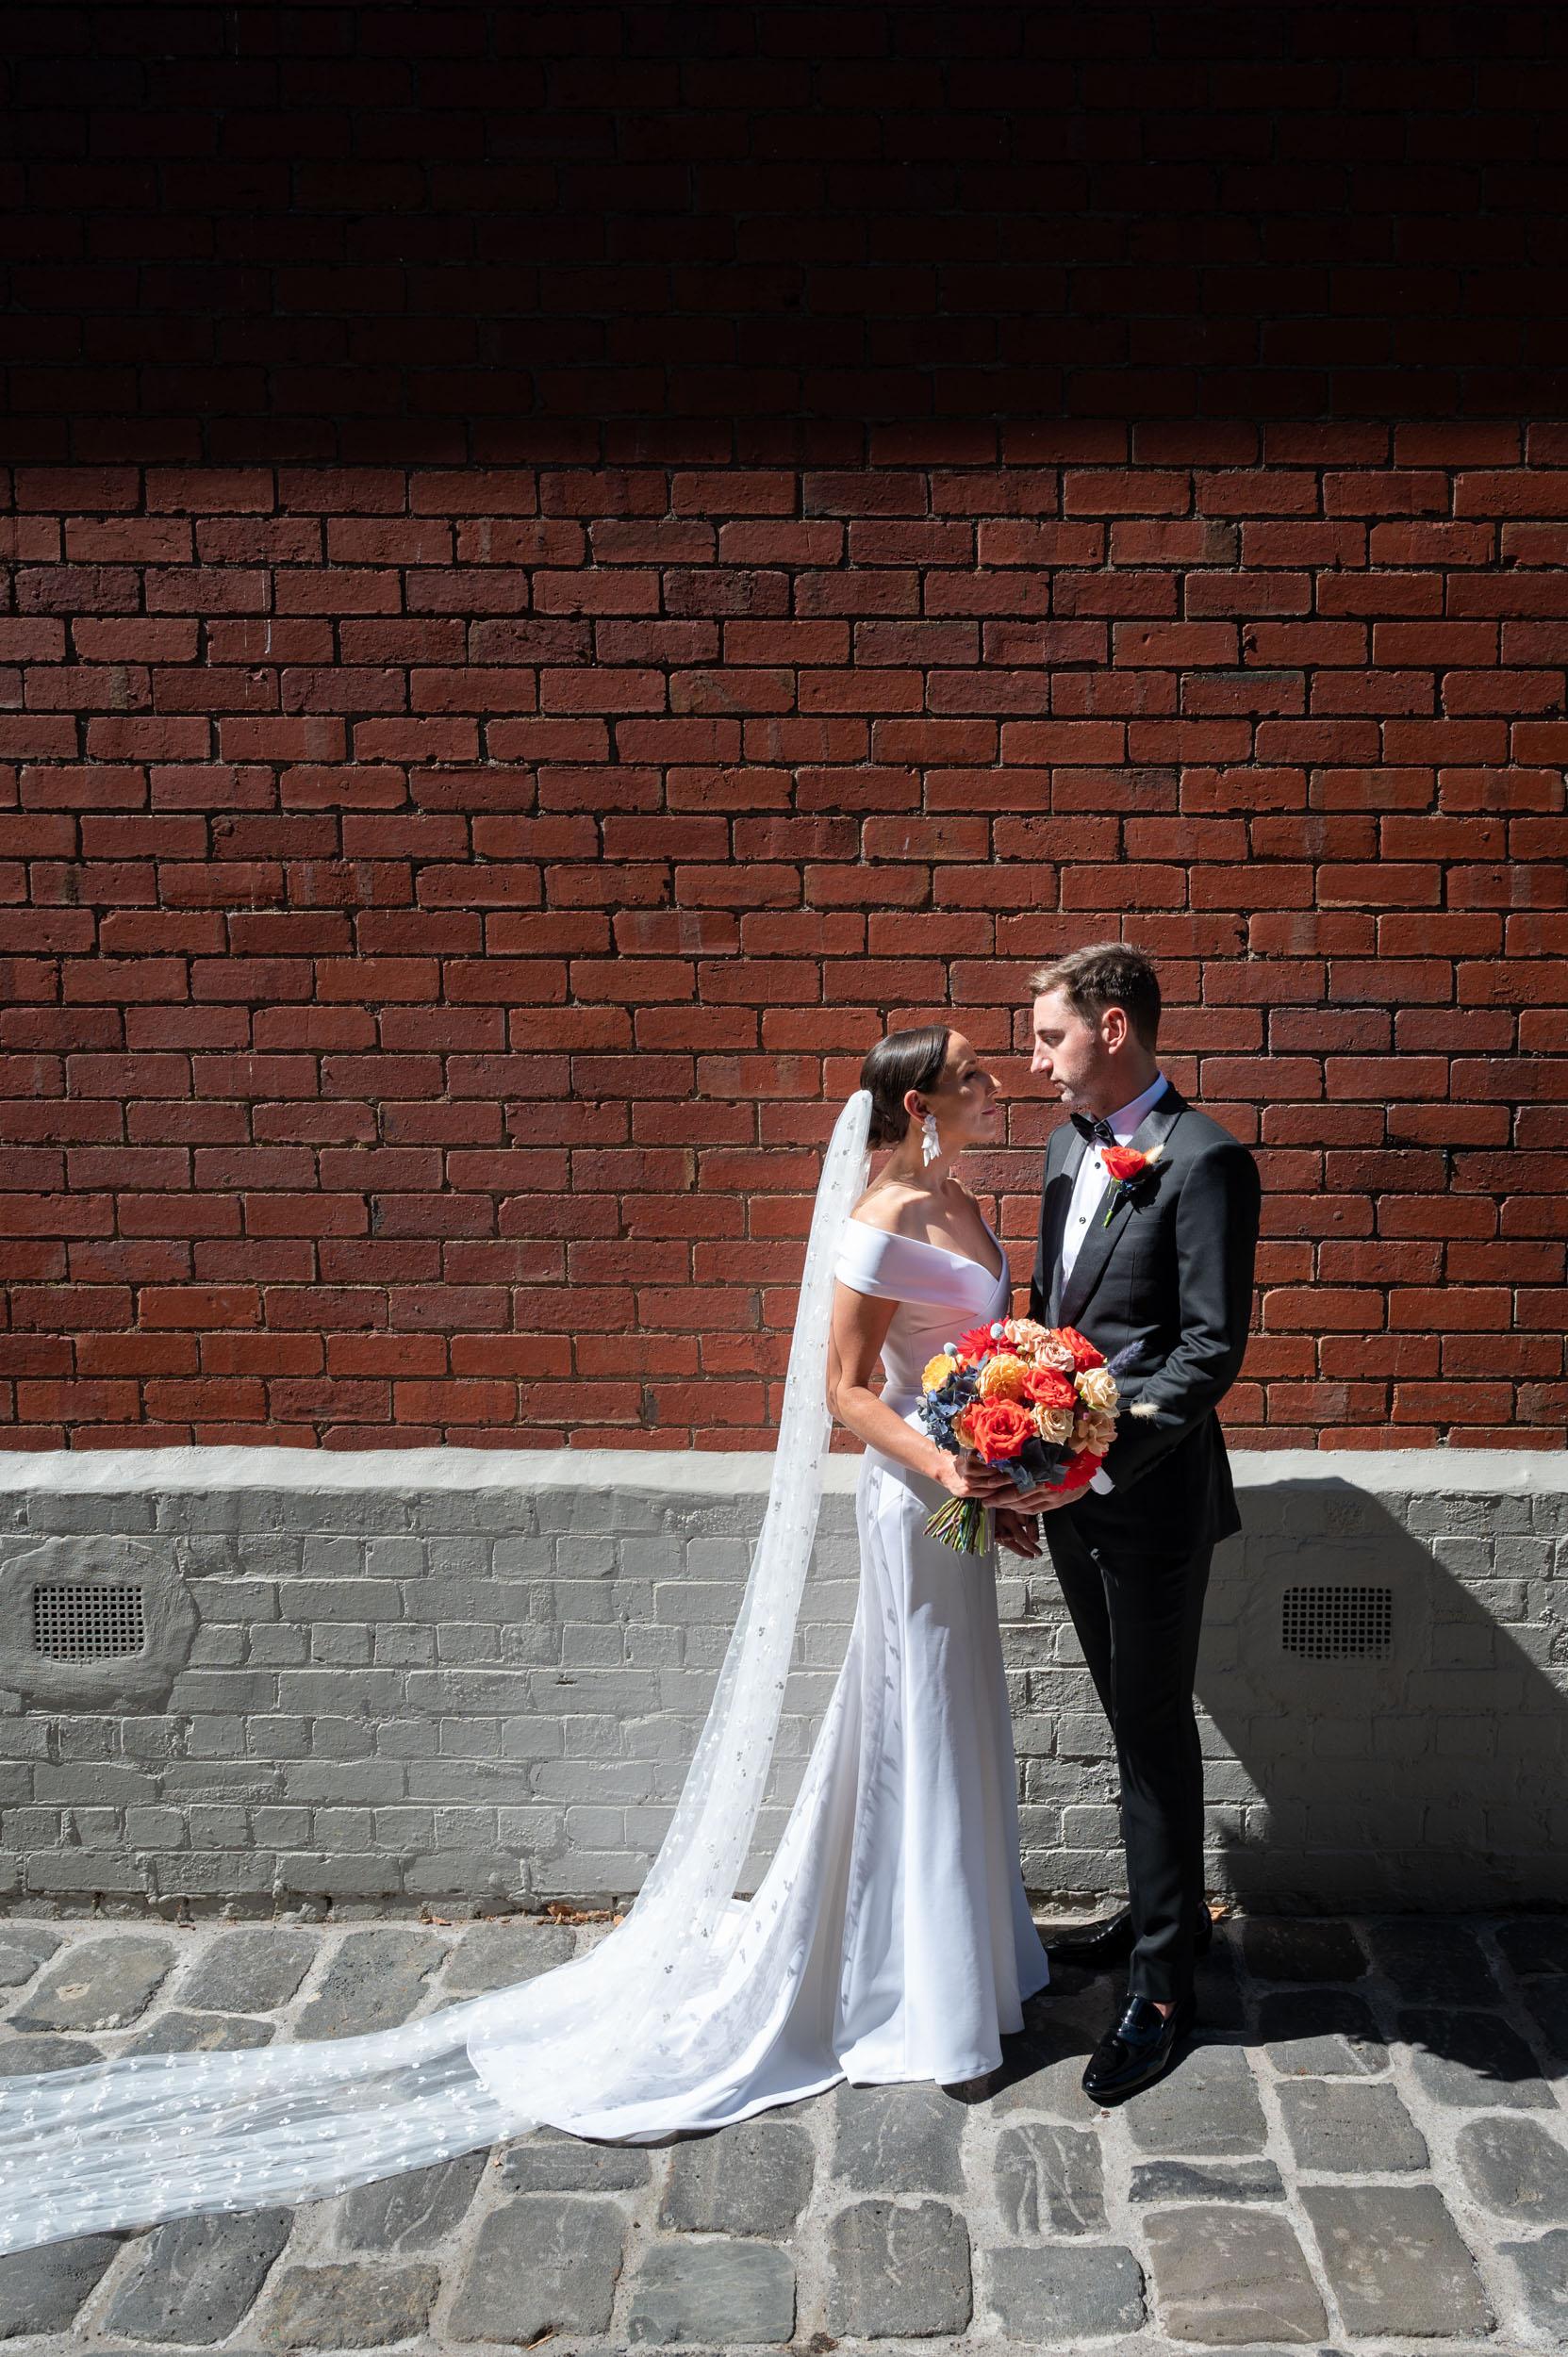 Wedding, Bridal Shoot, Bride & Groom, Wedding Bouquet, Georgia Young Couture, Lover Alfalfa Florals, Melbourne Laneway, Melbourne Wedding, Brad Geddes Photography